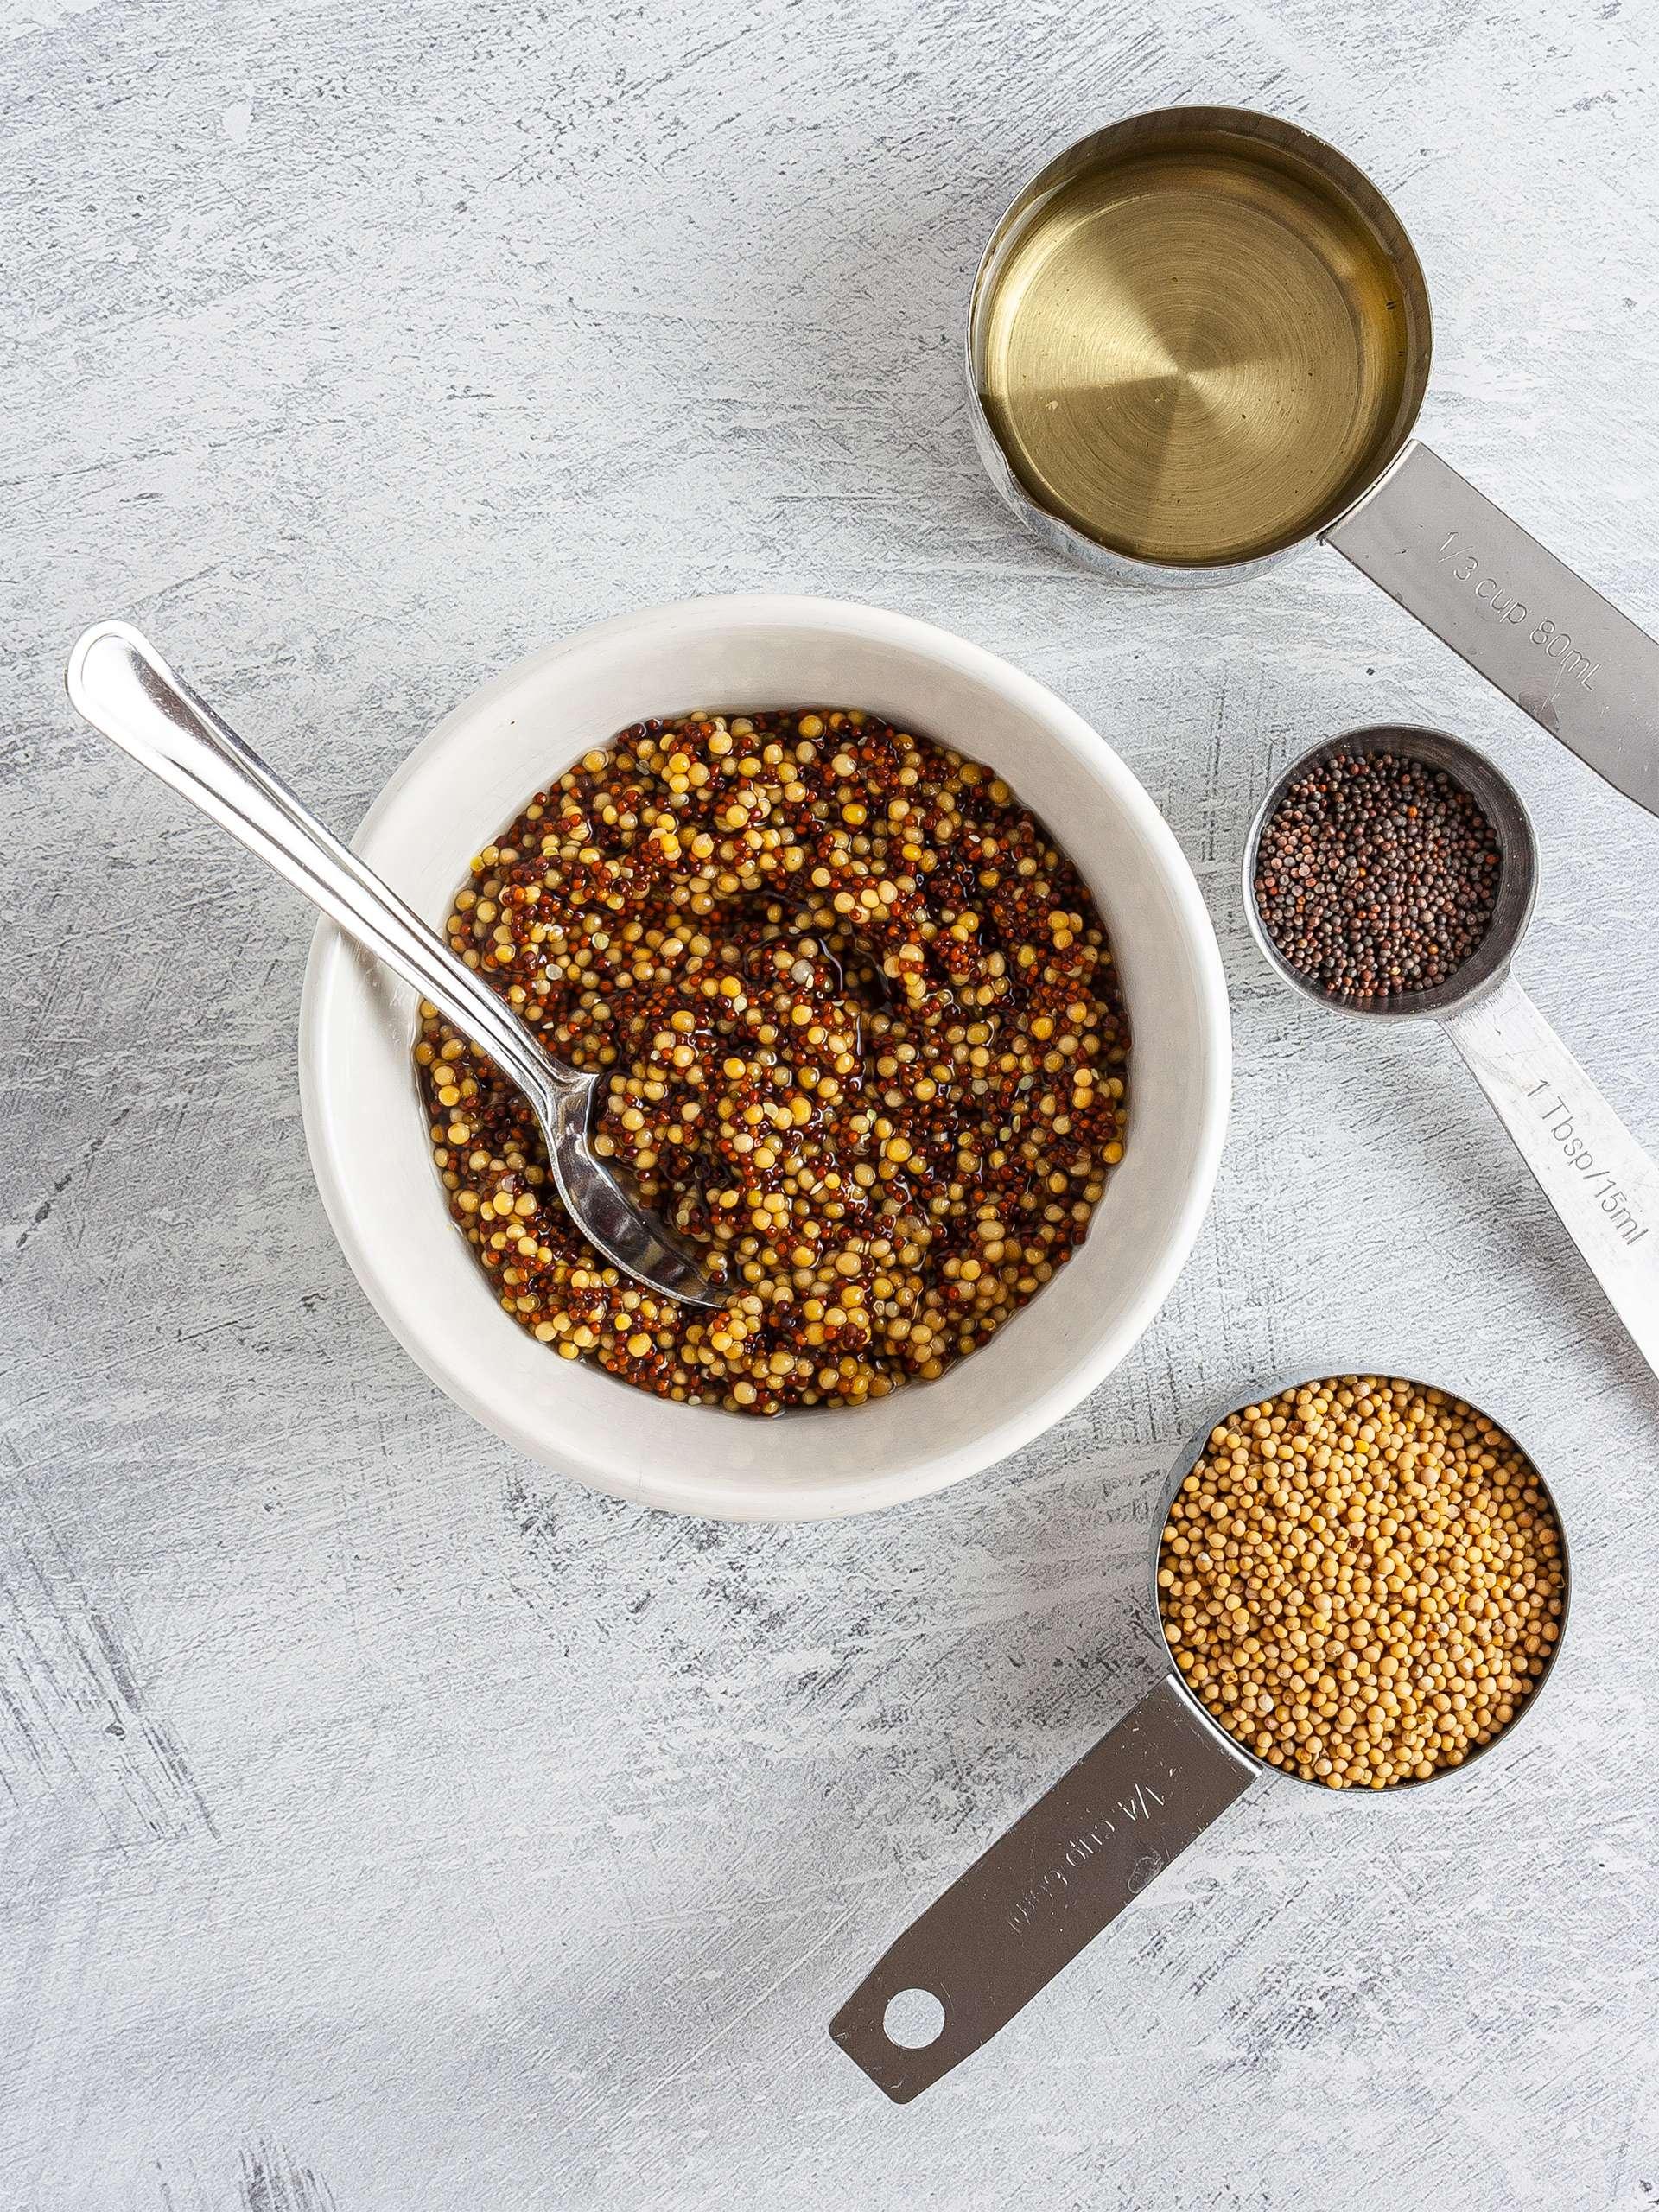 Soaked mustard seeds